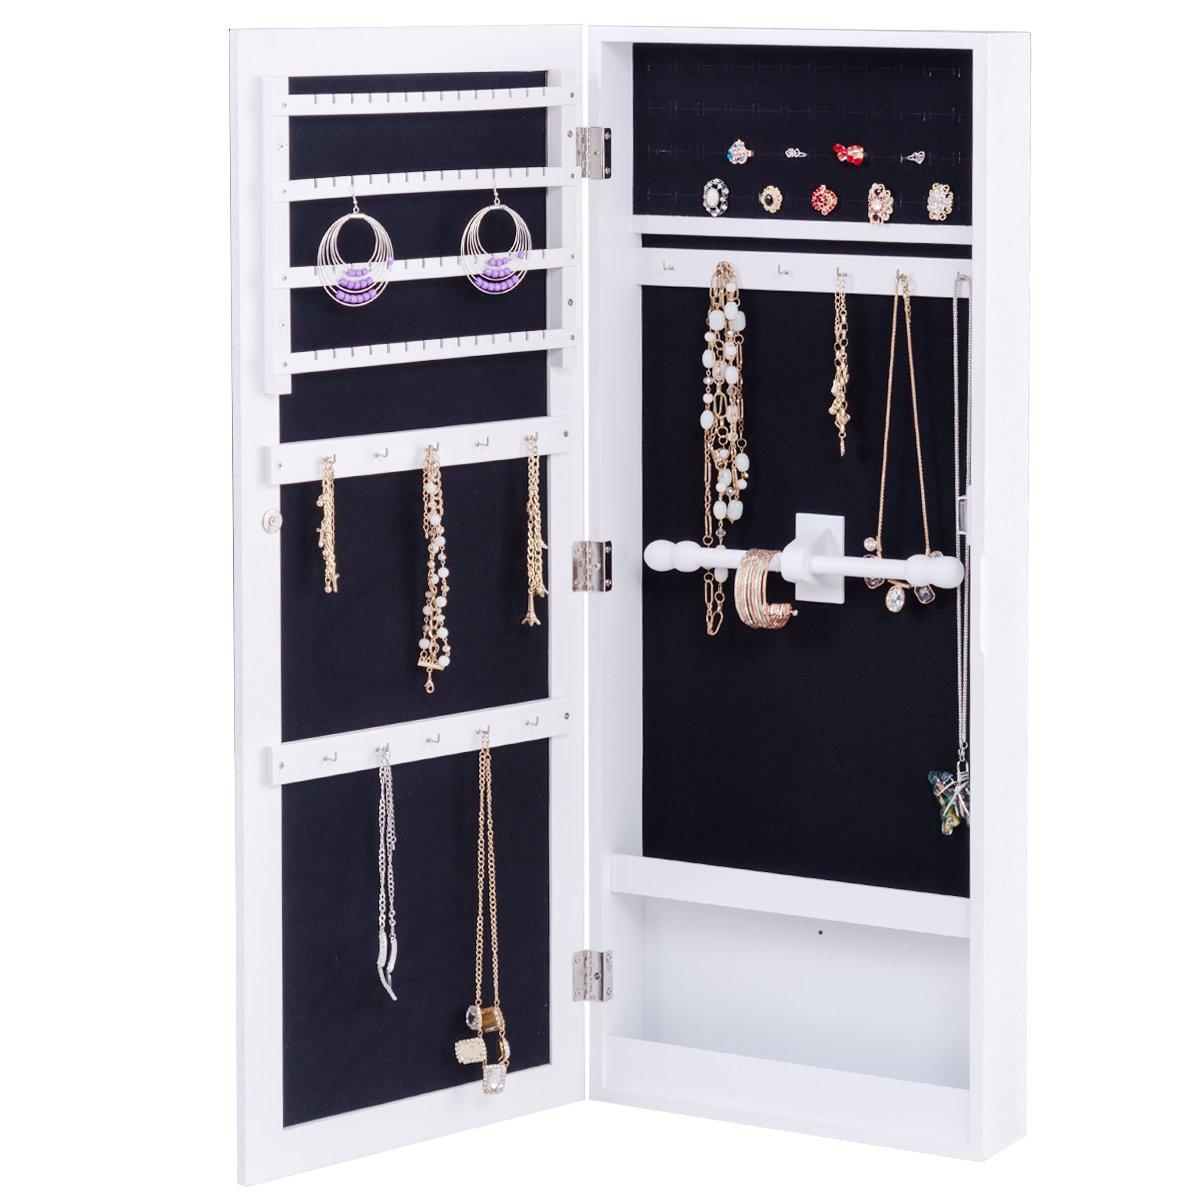 Giantex Jewelry Armoire Cabinet Wall Mounted Mirrored Jewelry Organizer Storage, Flash Silvery